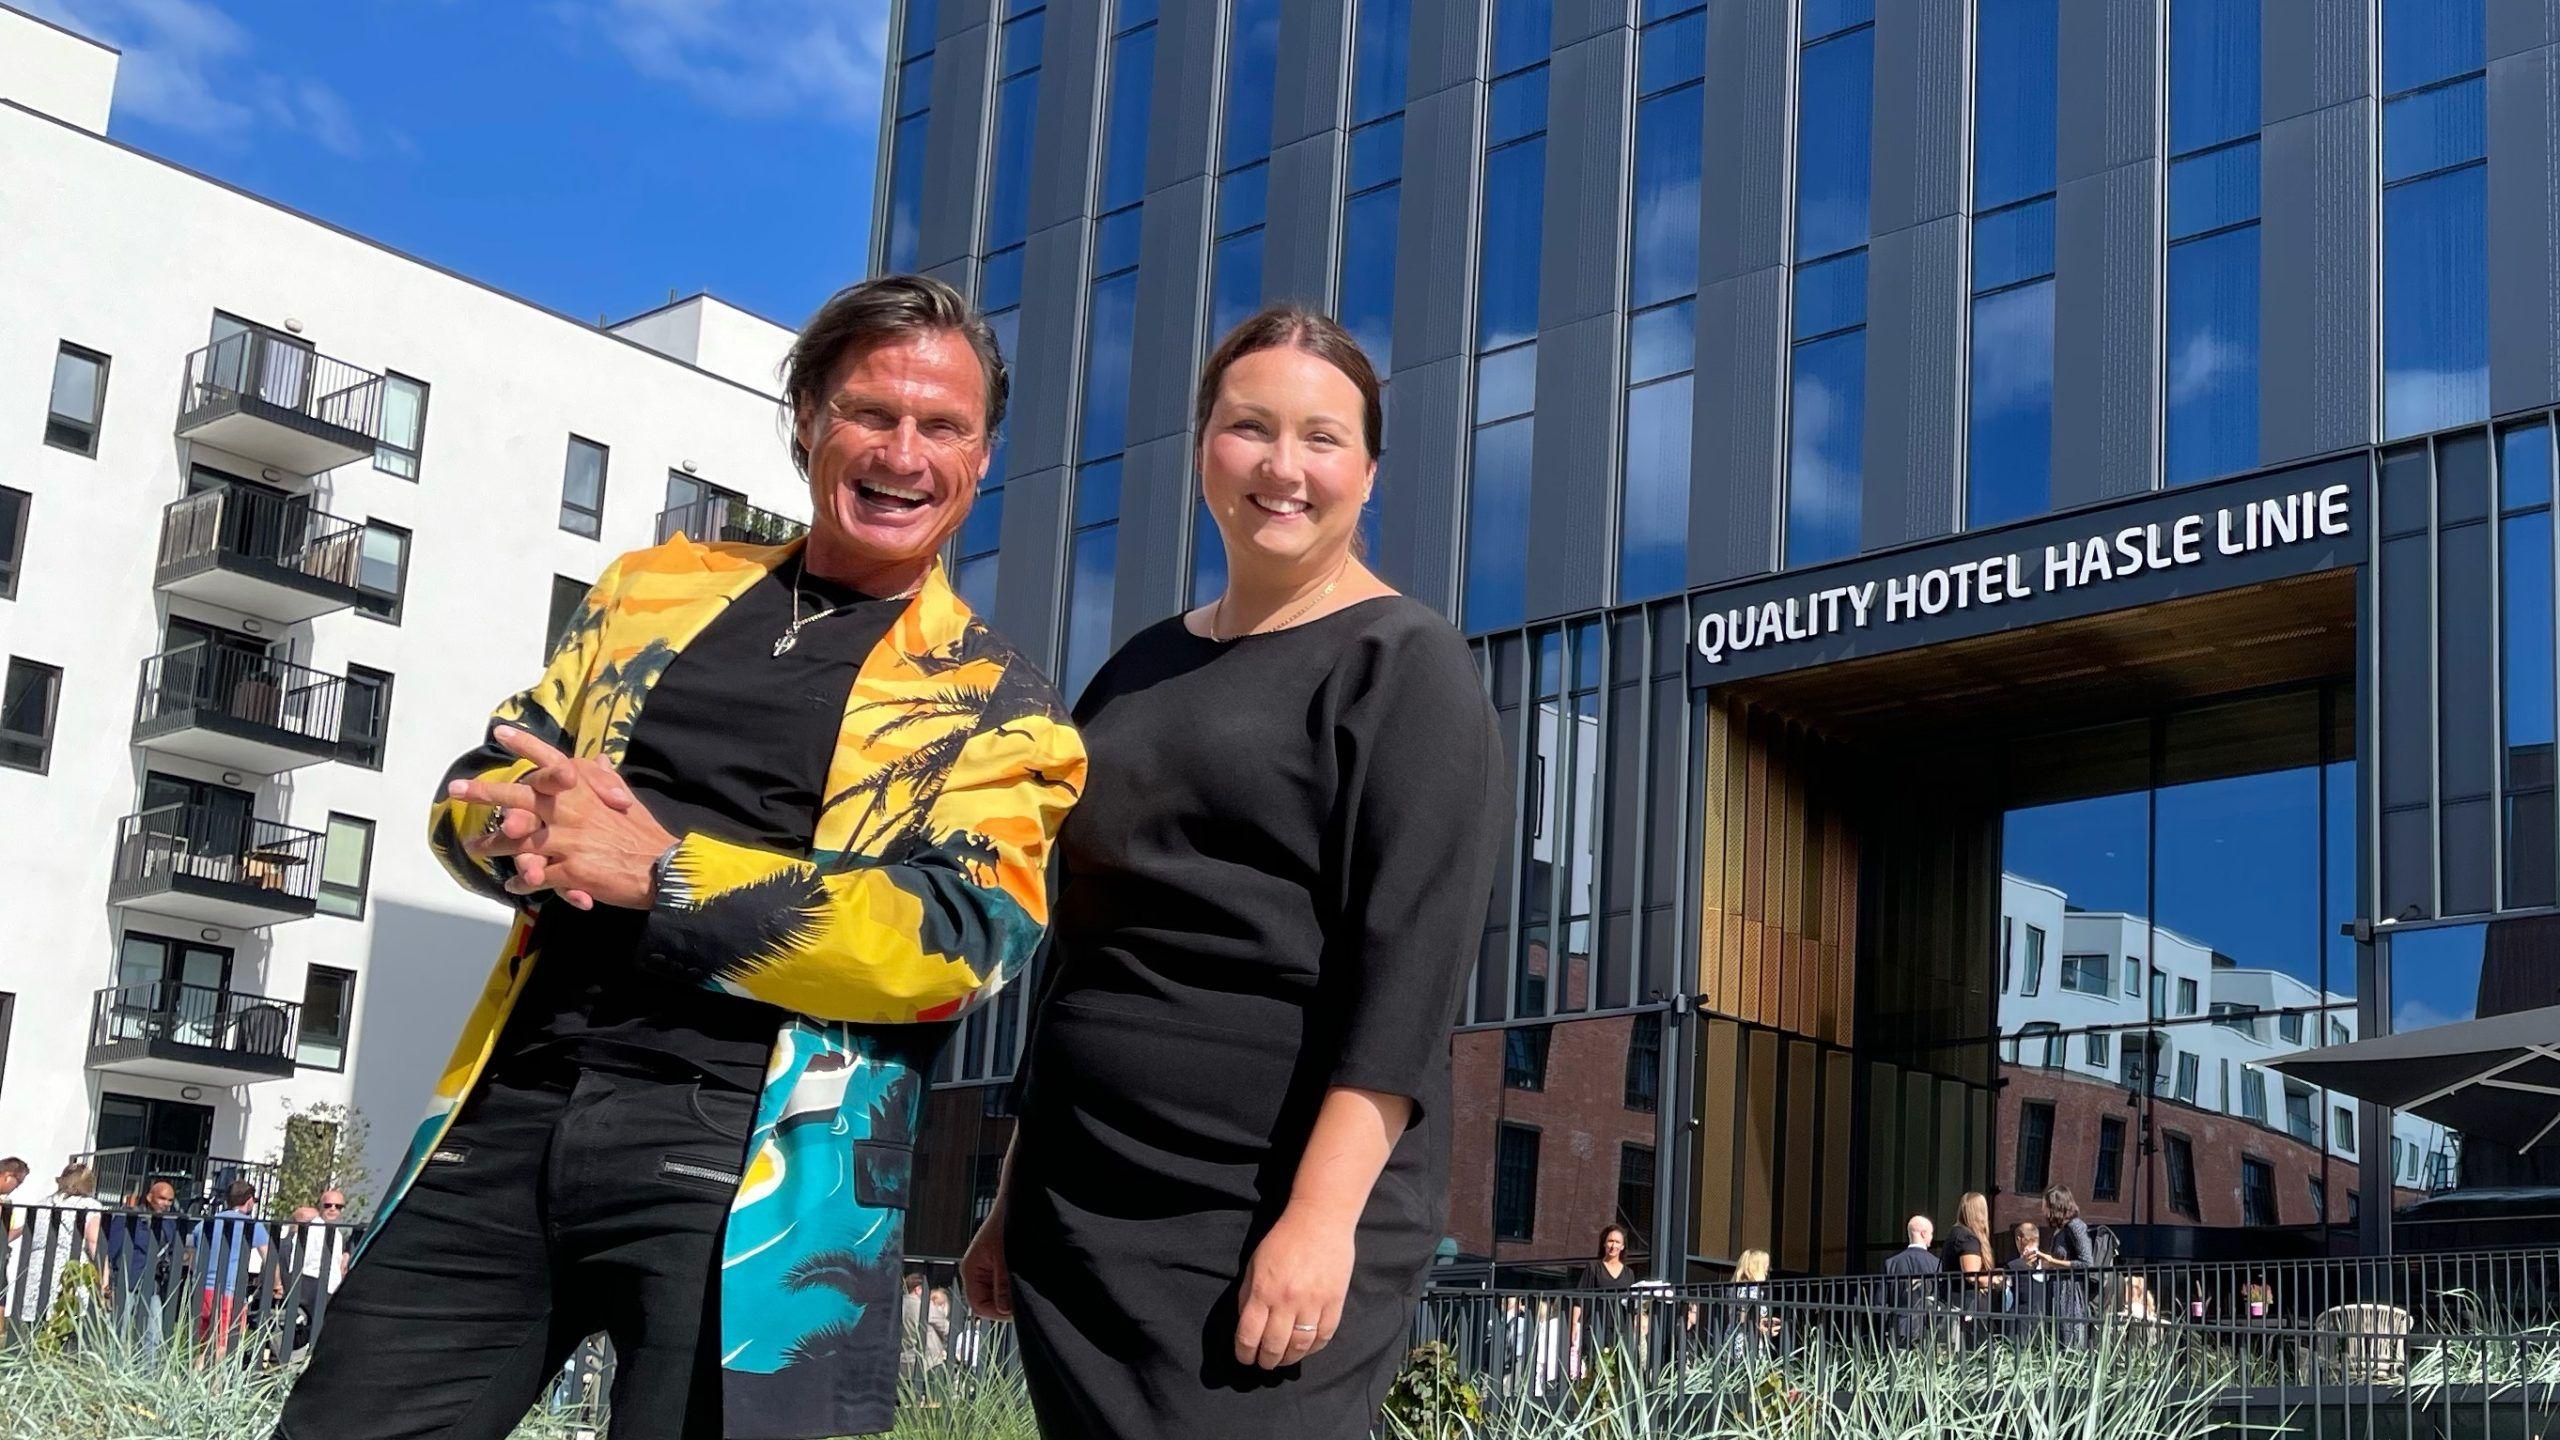 Petter A. Stordalen - Sara Jensen - Quality Hotel Hasle Linie - 2021